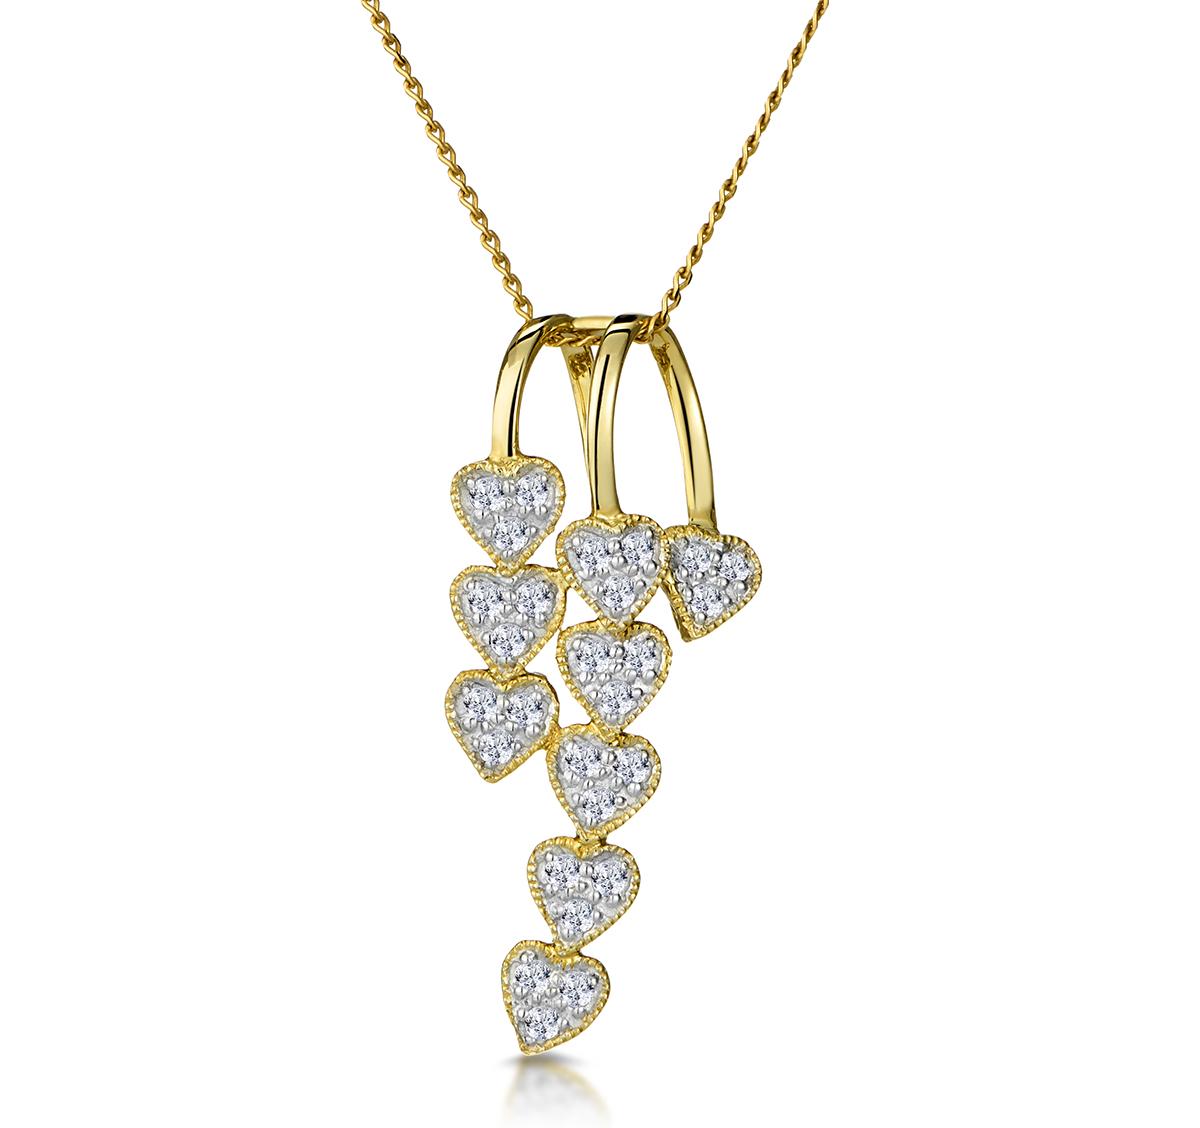 FANCY PENDANT 0.23CT DIAMOND 9K YELLOW GOLD